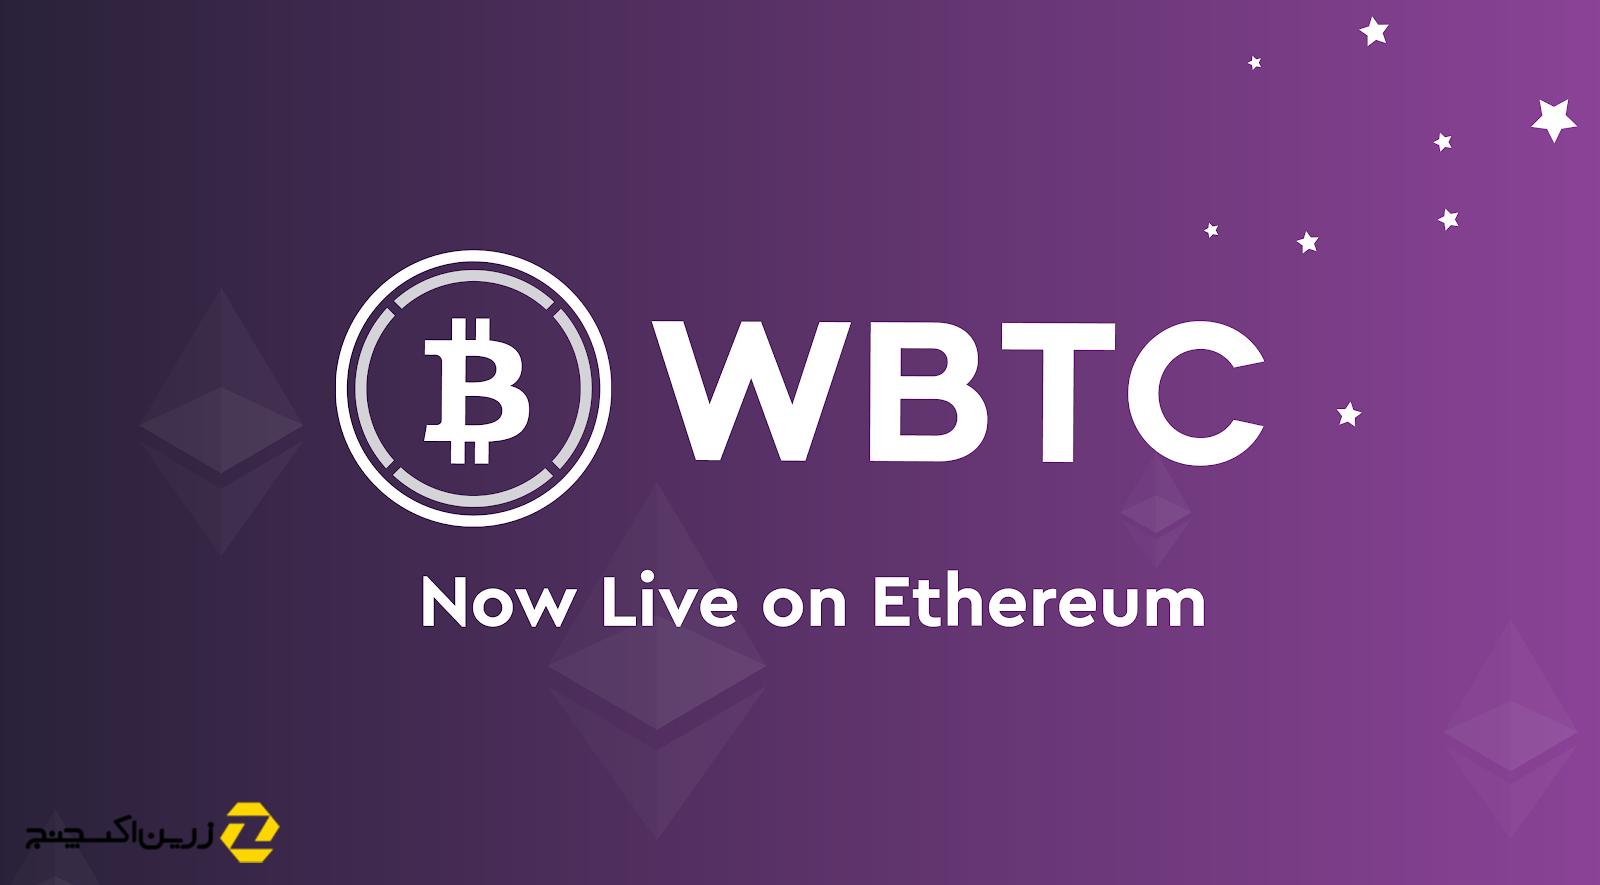 Wrapped Bitcoin چیست و چه هدفی را دنبال میکند